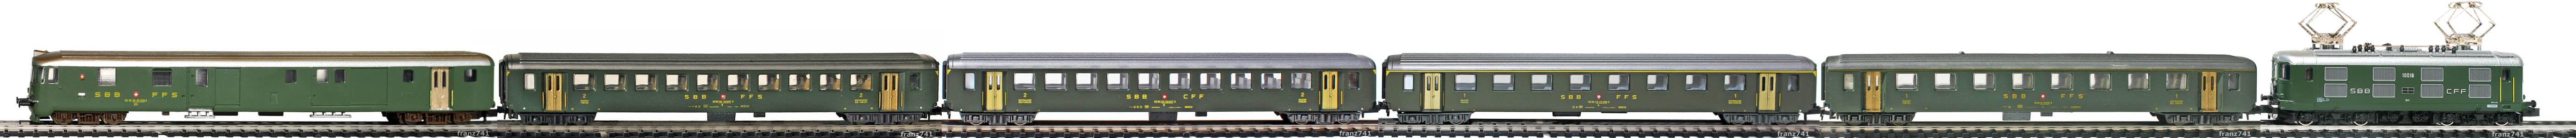 Epoche-IV-SBB-EW-I-Personenzug_Re-4-4-I-Elok-DZt-EW-I-Wagen-altes-Logo